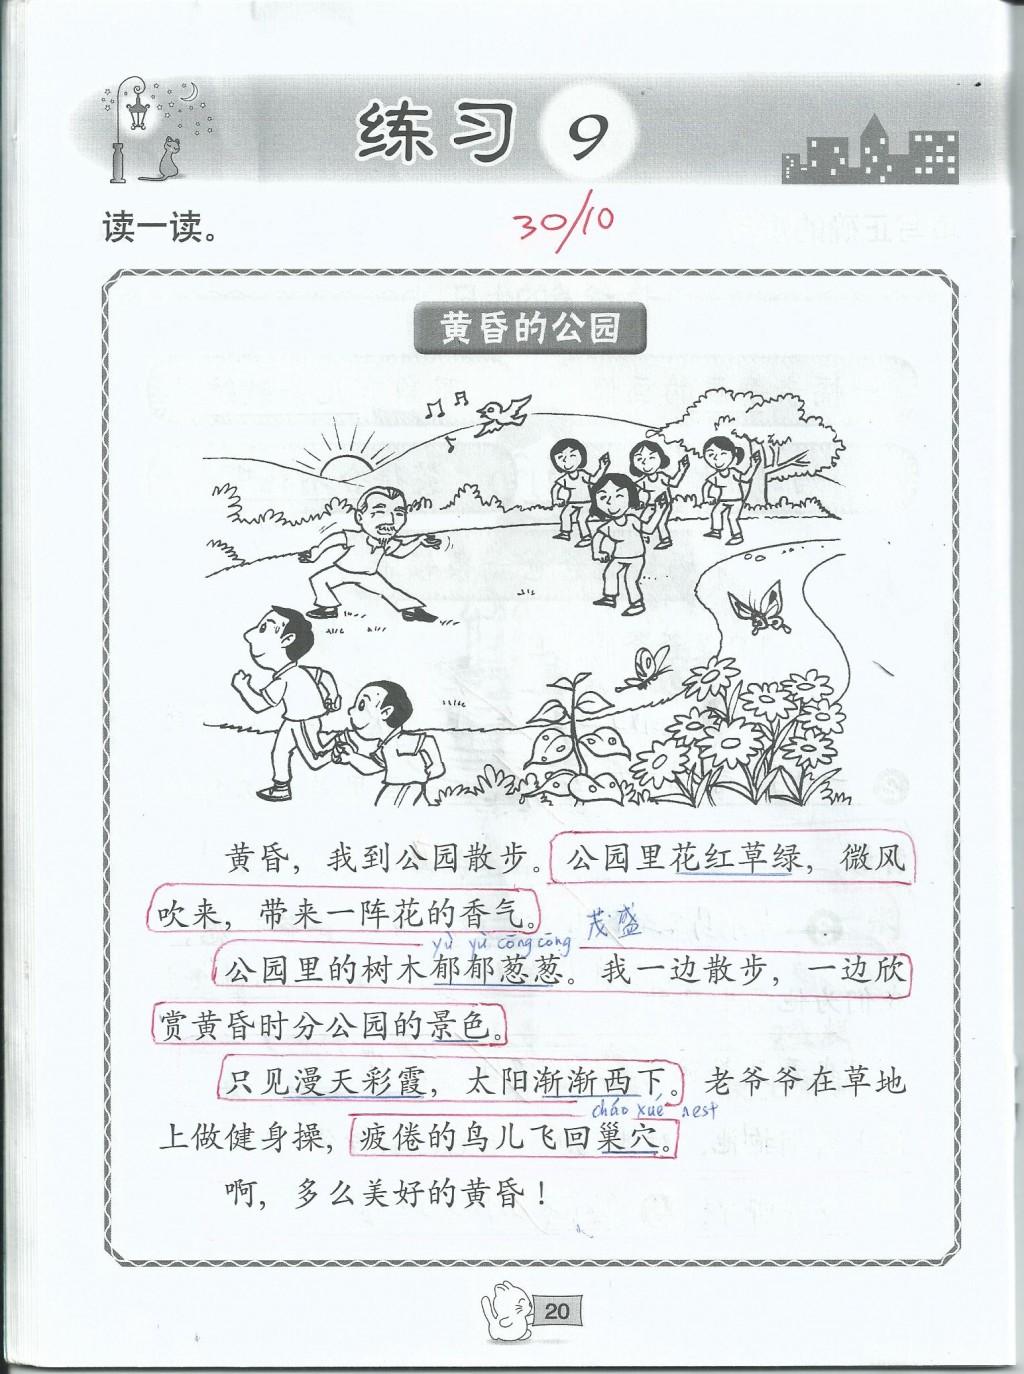 005 Writing00031 Chinese Essay Amazing Art Topics Vce Formats Sheet Large